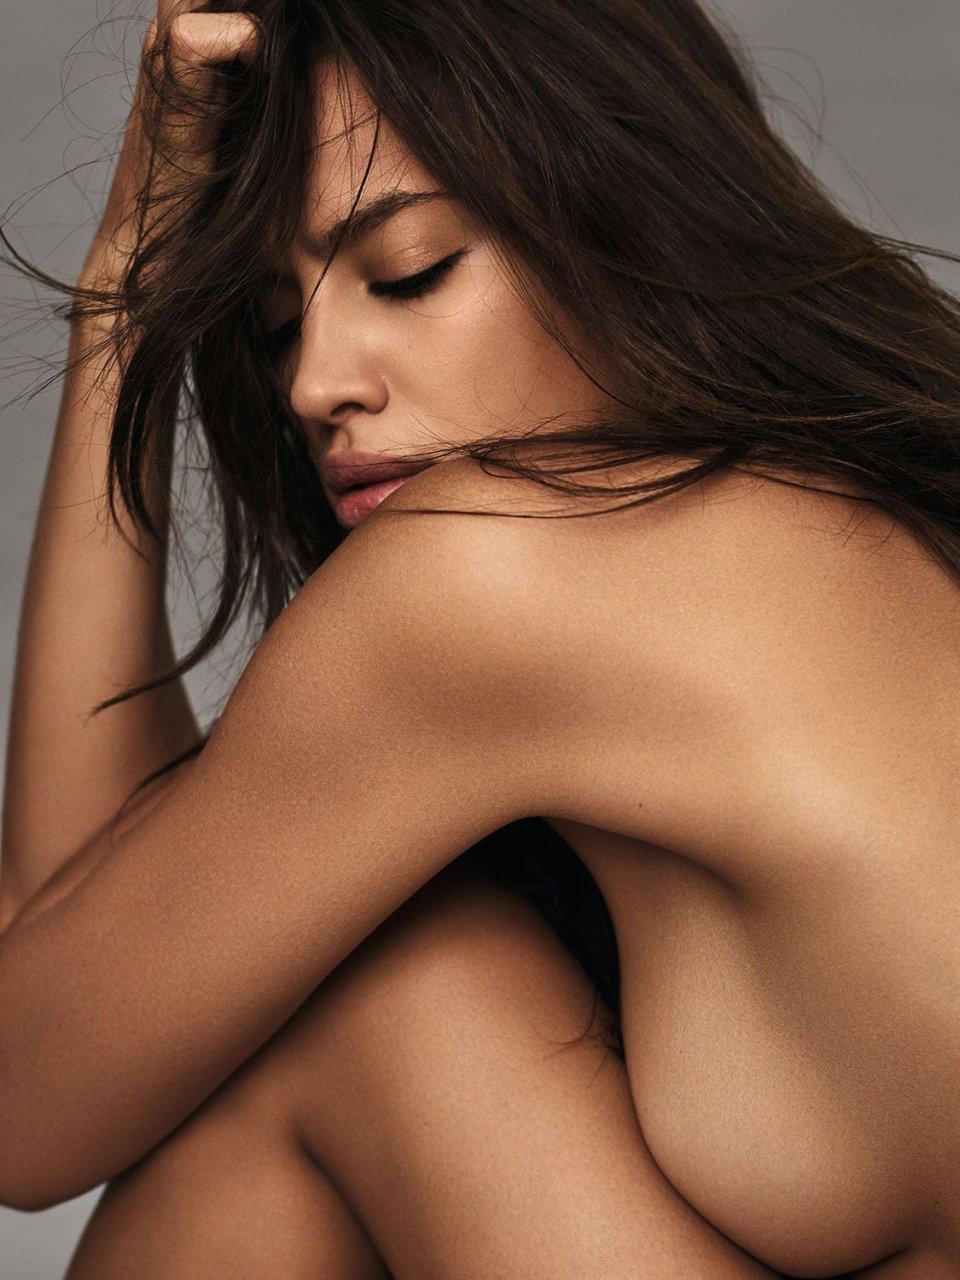 adult free photos nude women